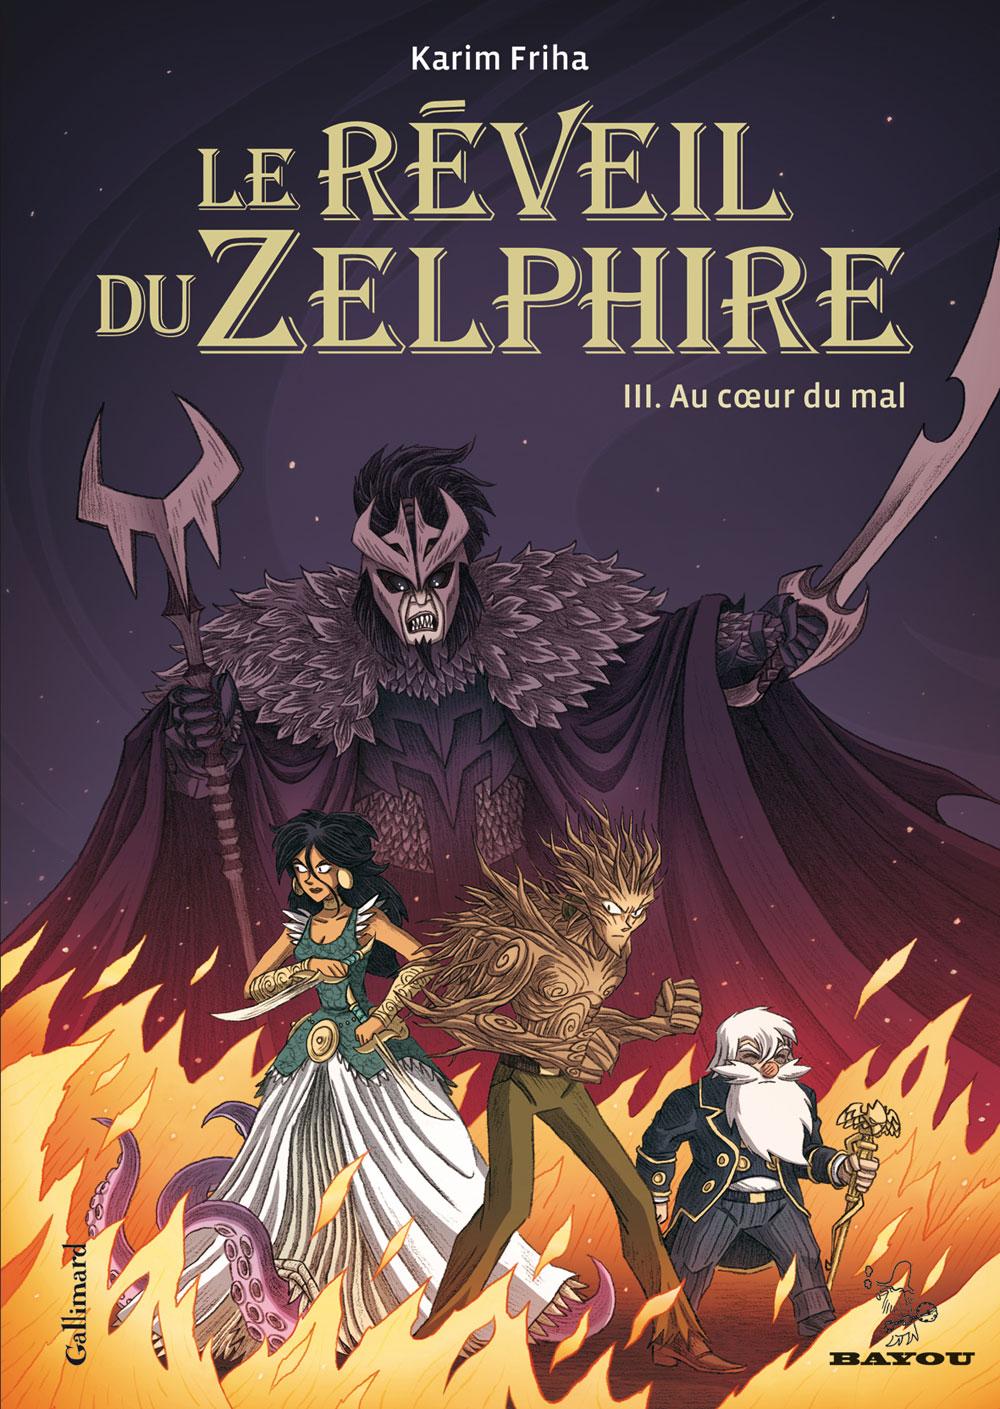 Reveil du zelphire - Au coeur du mal - Karim Friha